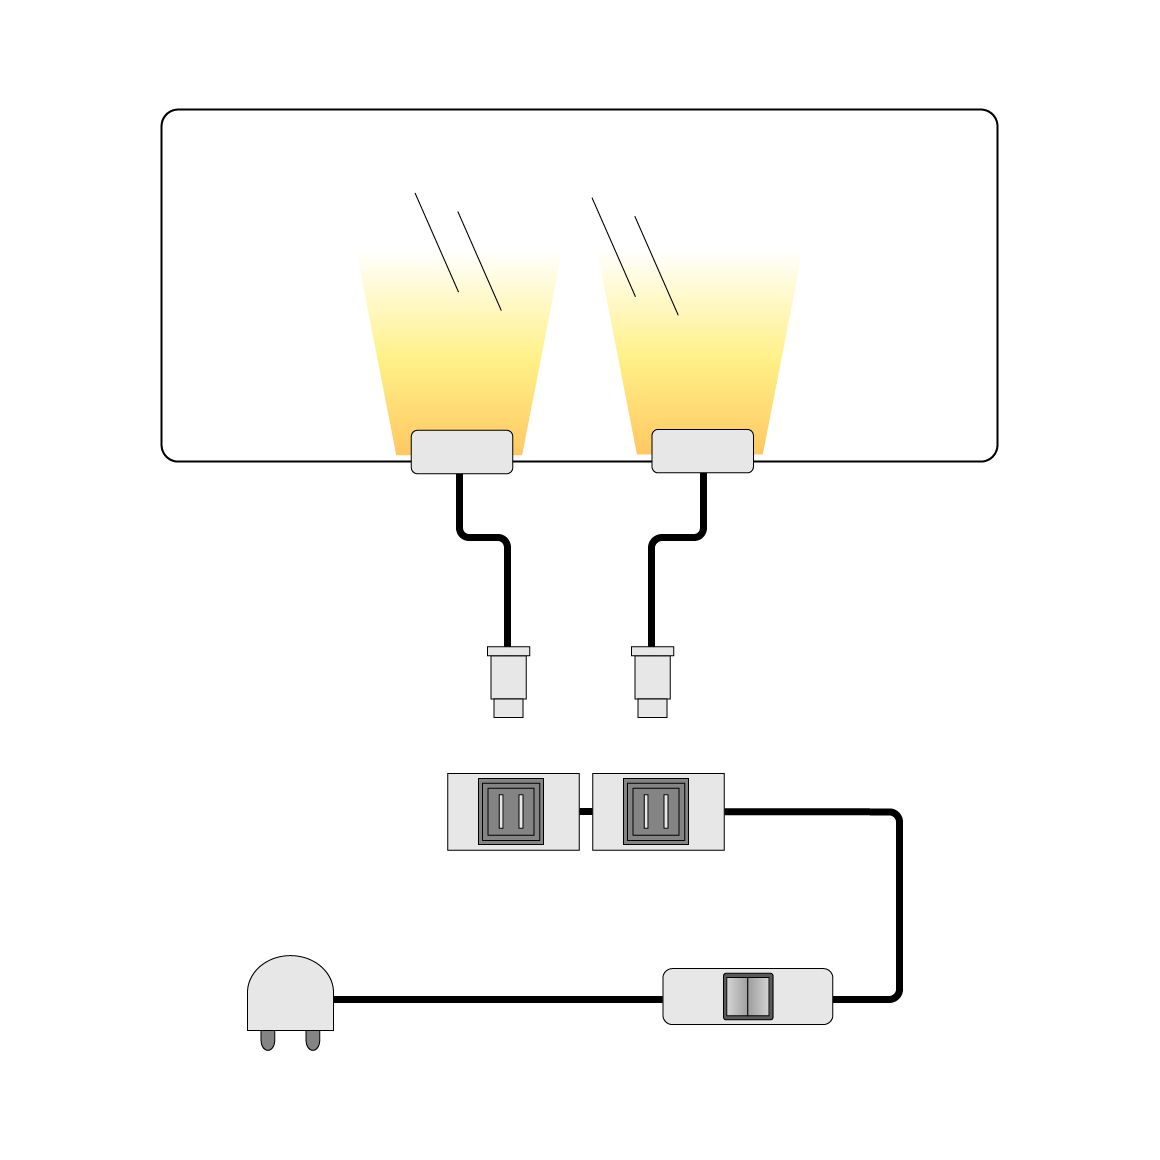 Image of energia A+, Illuminazioni LED per ripiani in vetro lopburi (set da 2) - Bianco, Lux